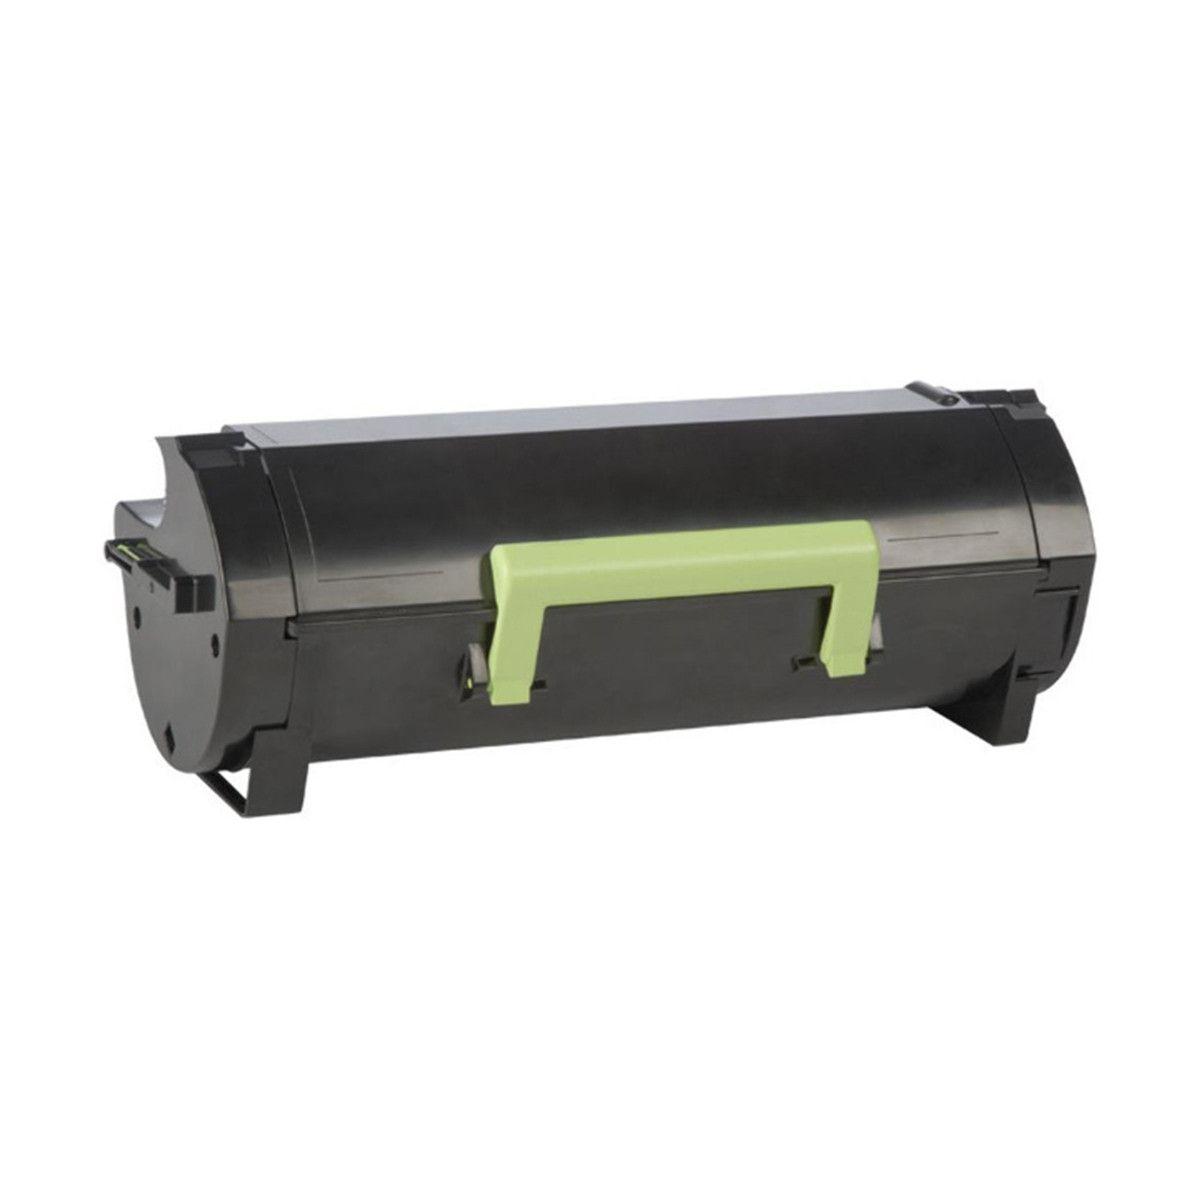 Toner compatível Lexmark - [B0XA0] MS517/MS617 MX517/MX617 - 20.000 Páginas - Cartucho & Cia